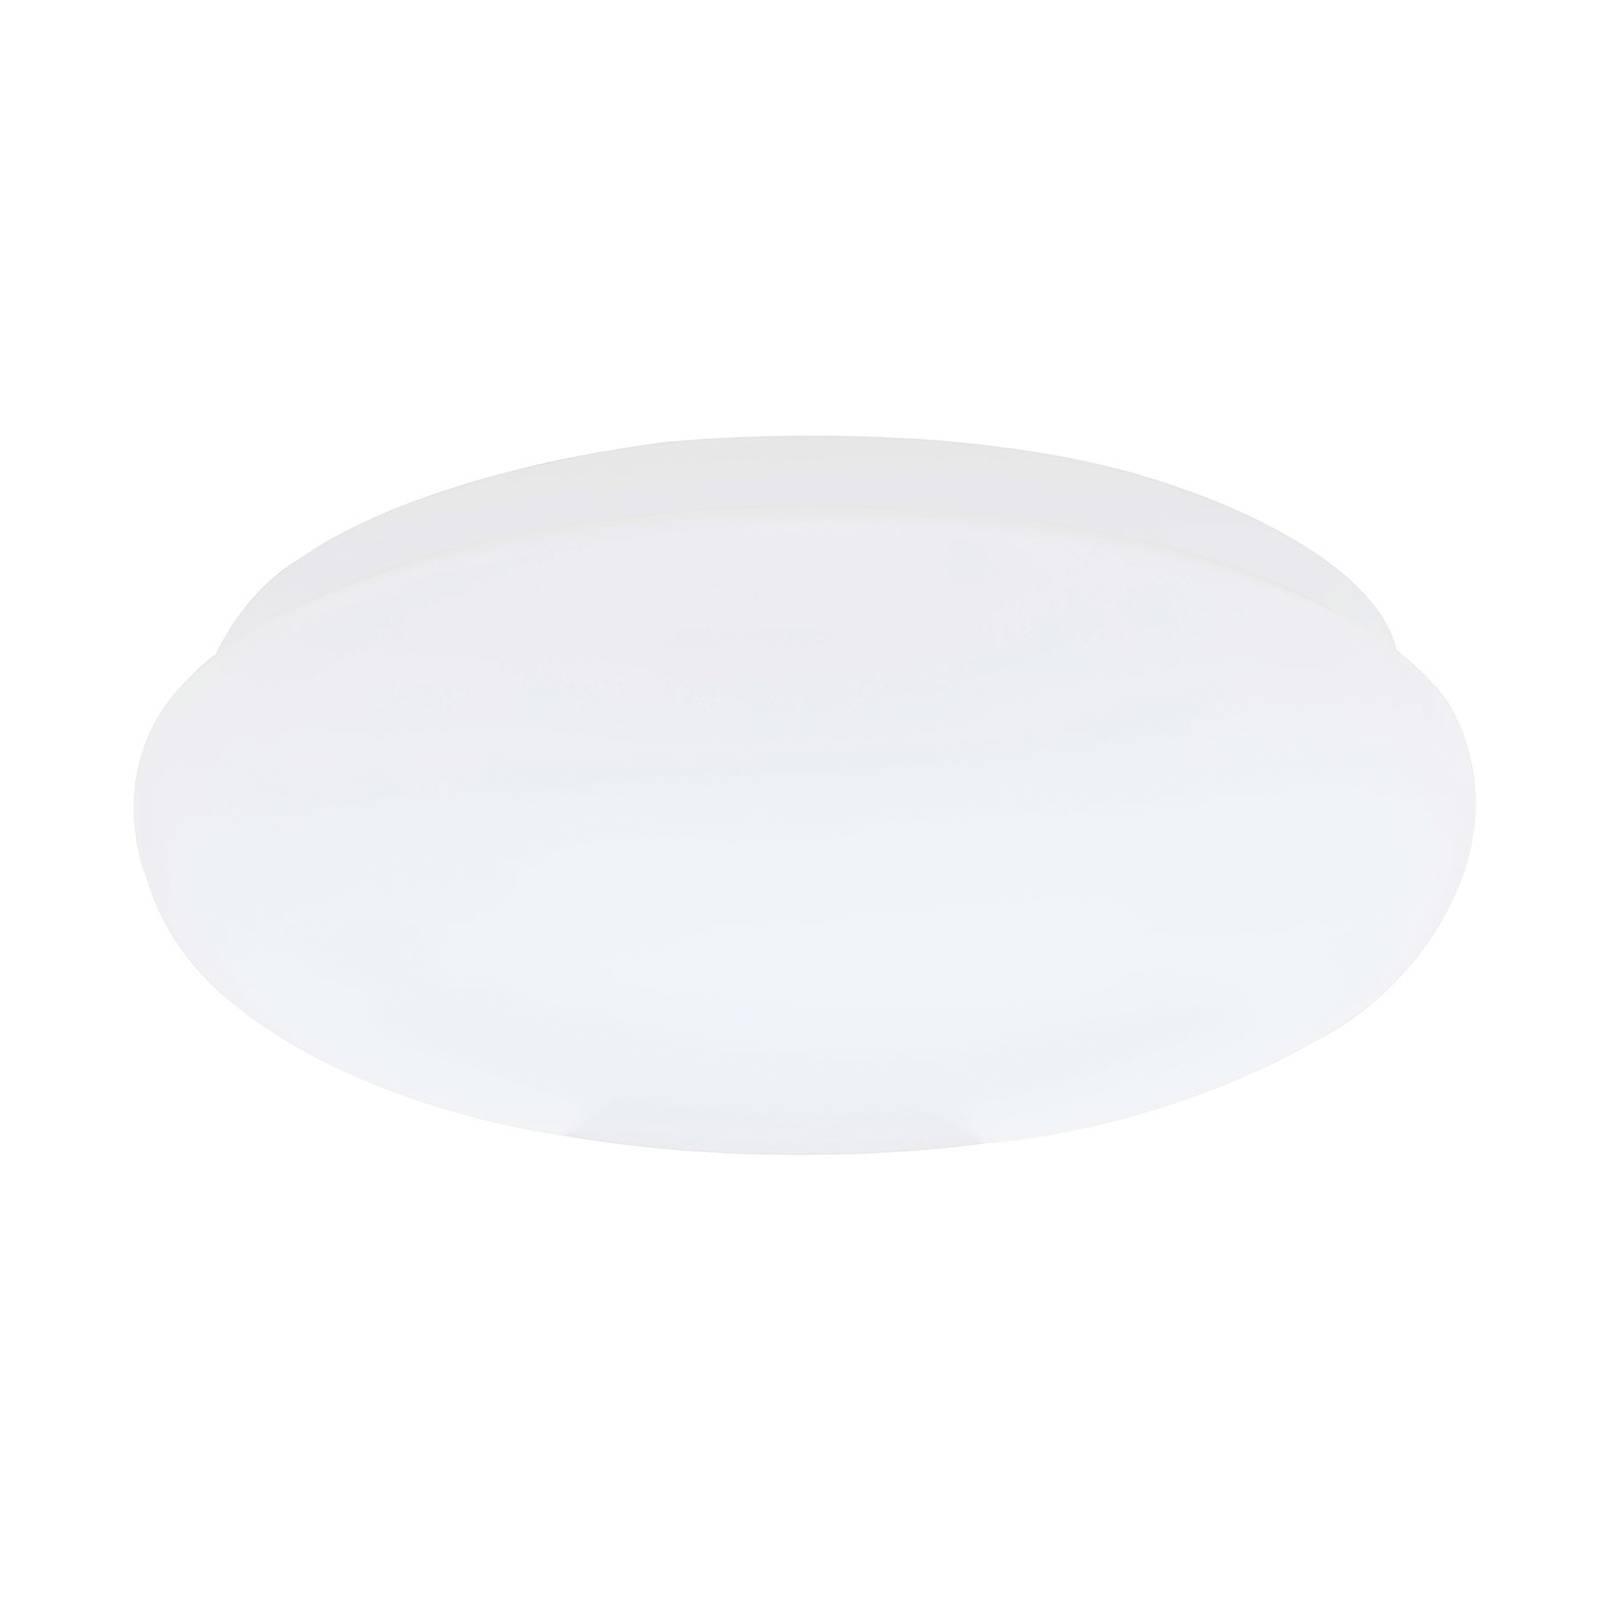 Siteco Rondel 40 LED-valaisin Ø 26,7 cm 830